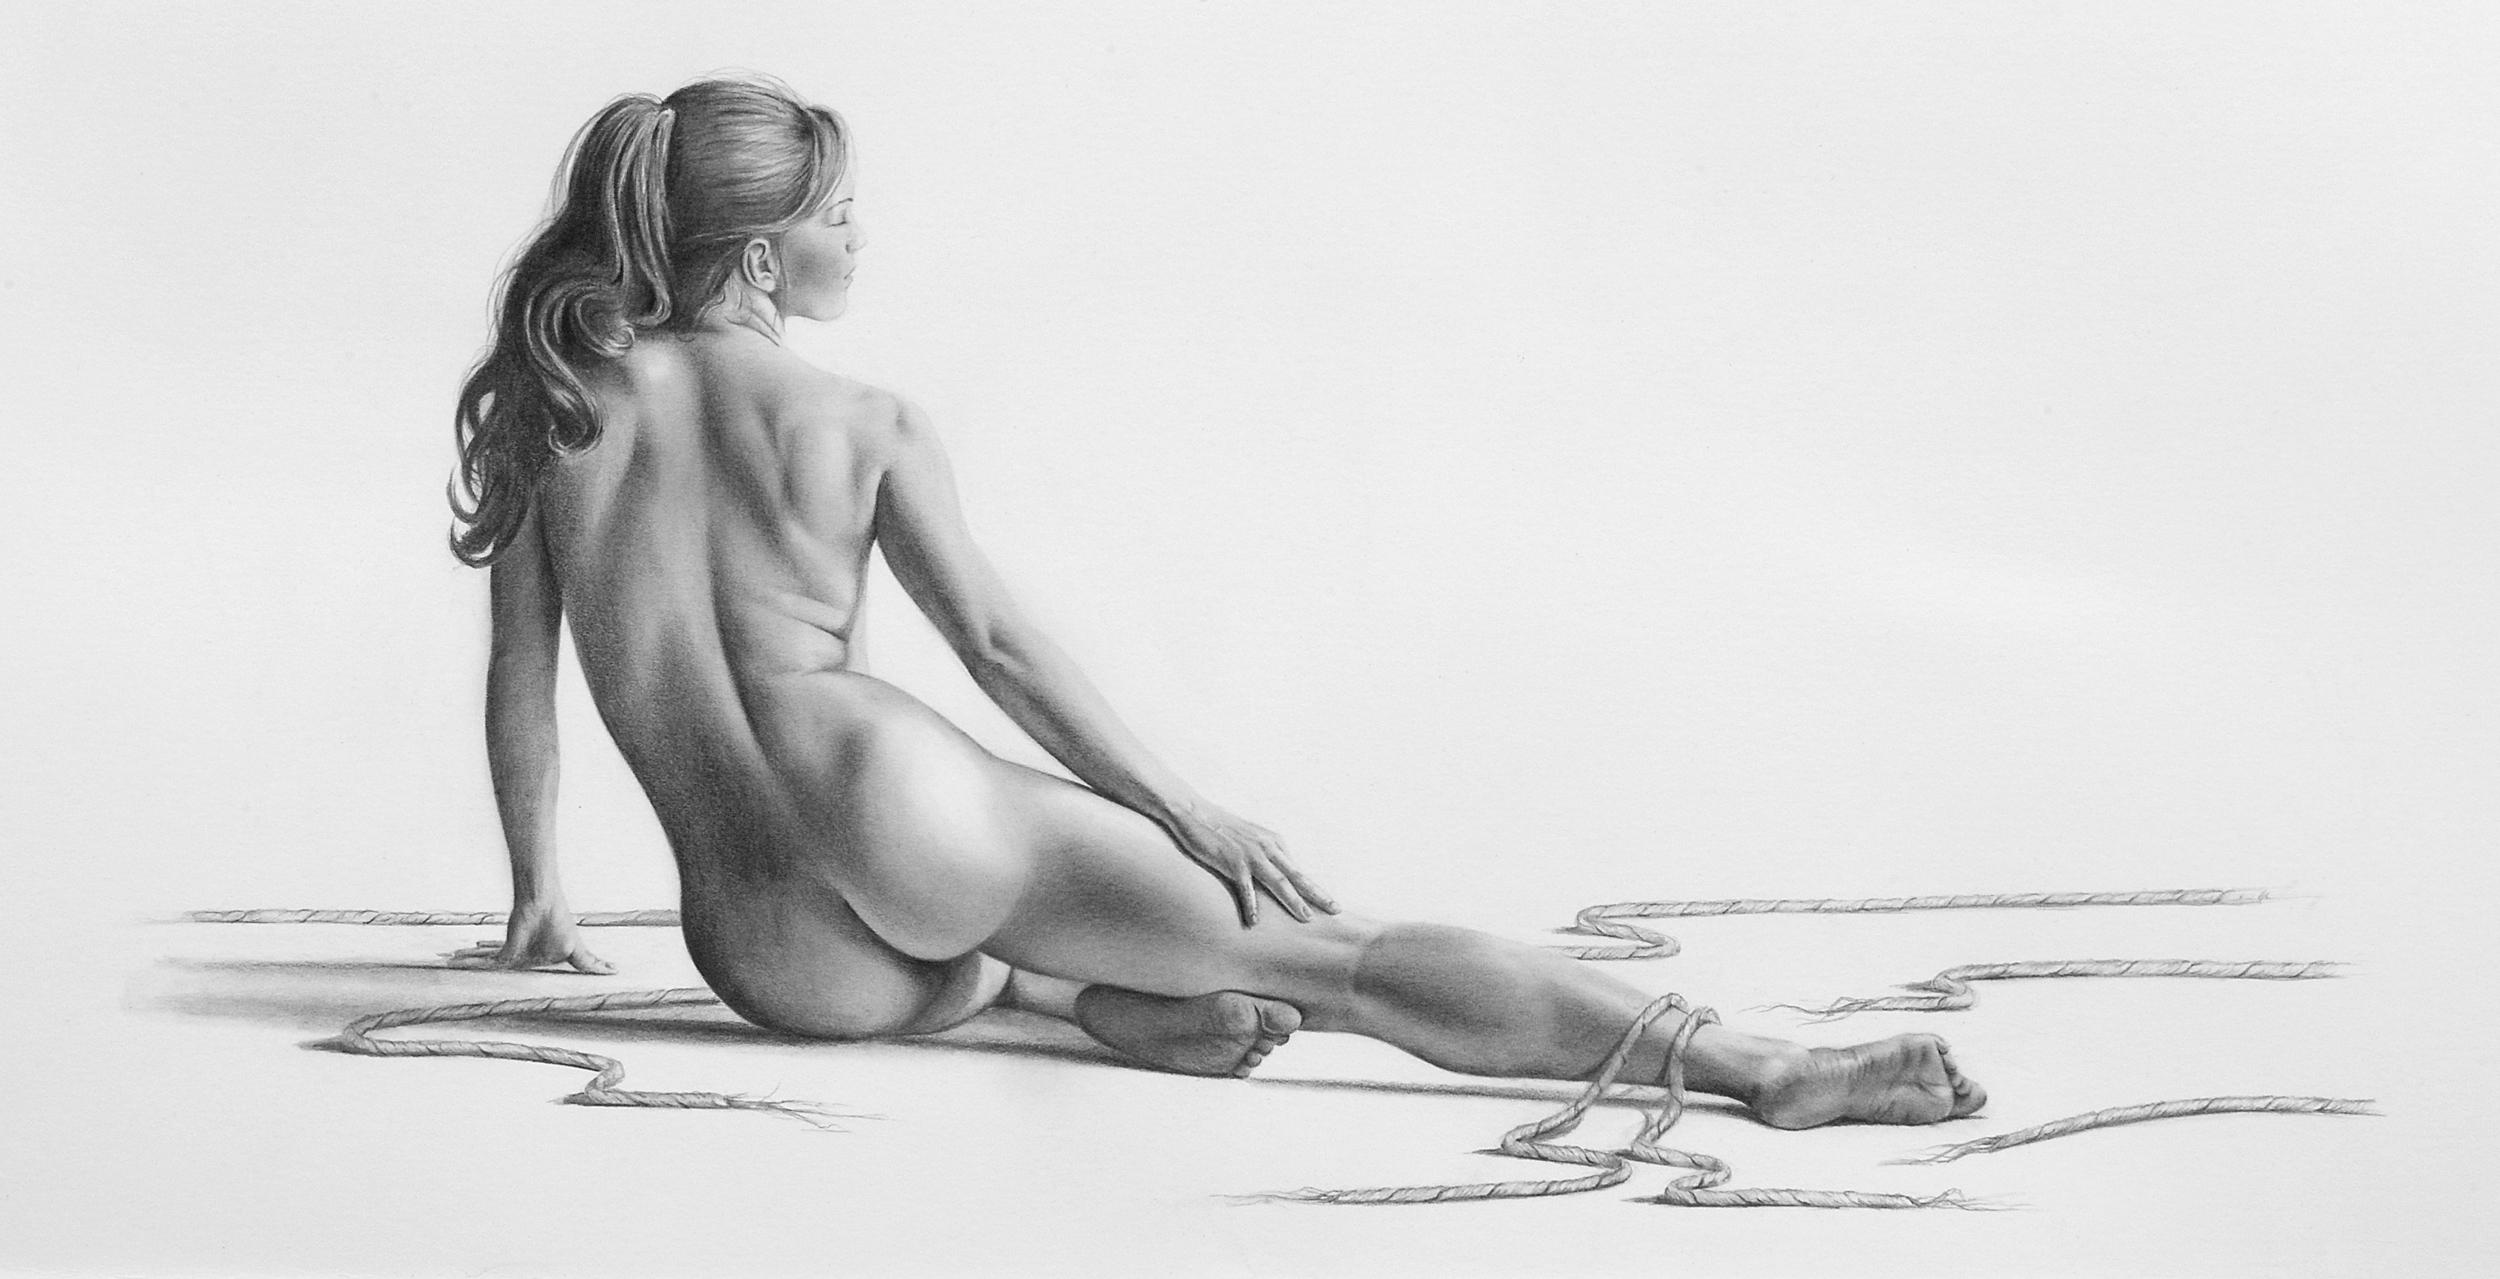 broken free-bill-higginson-artist-graphite-drawing-realism-black-and-white